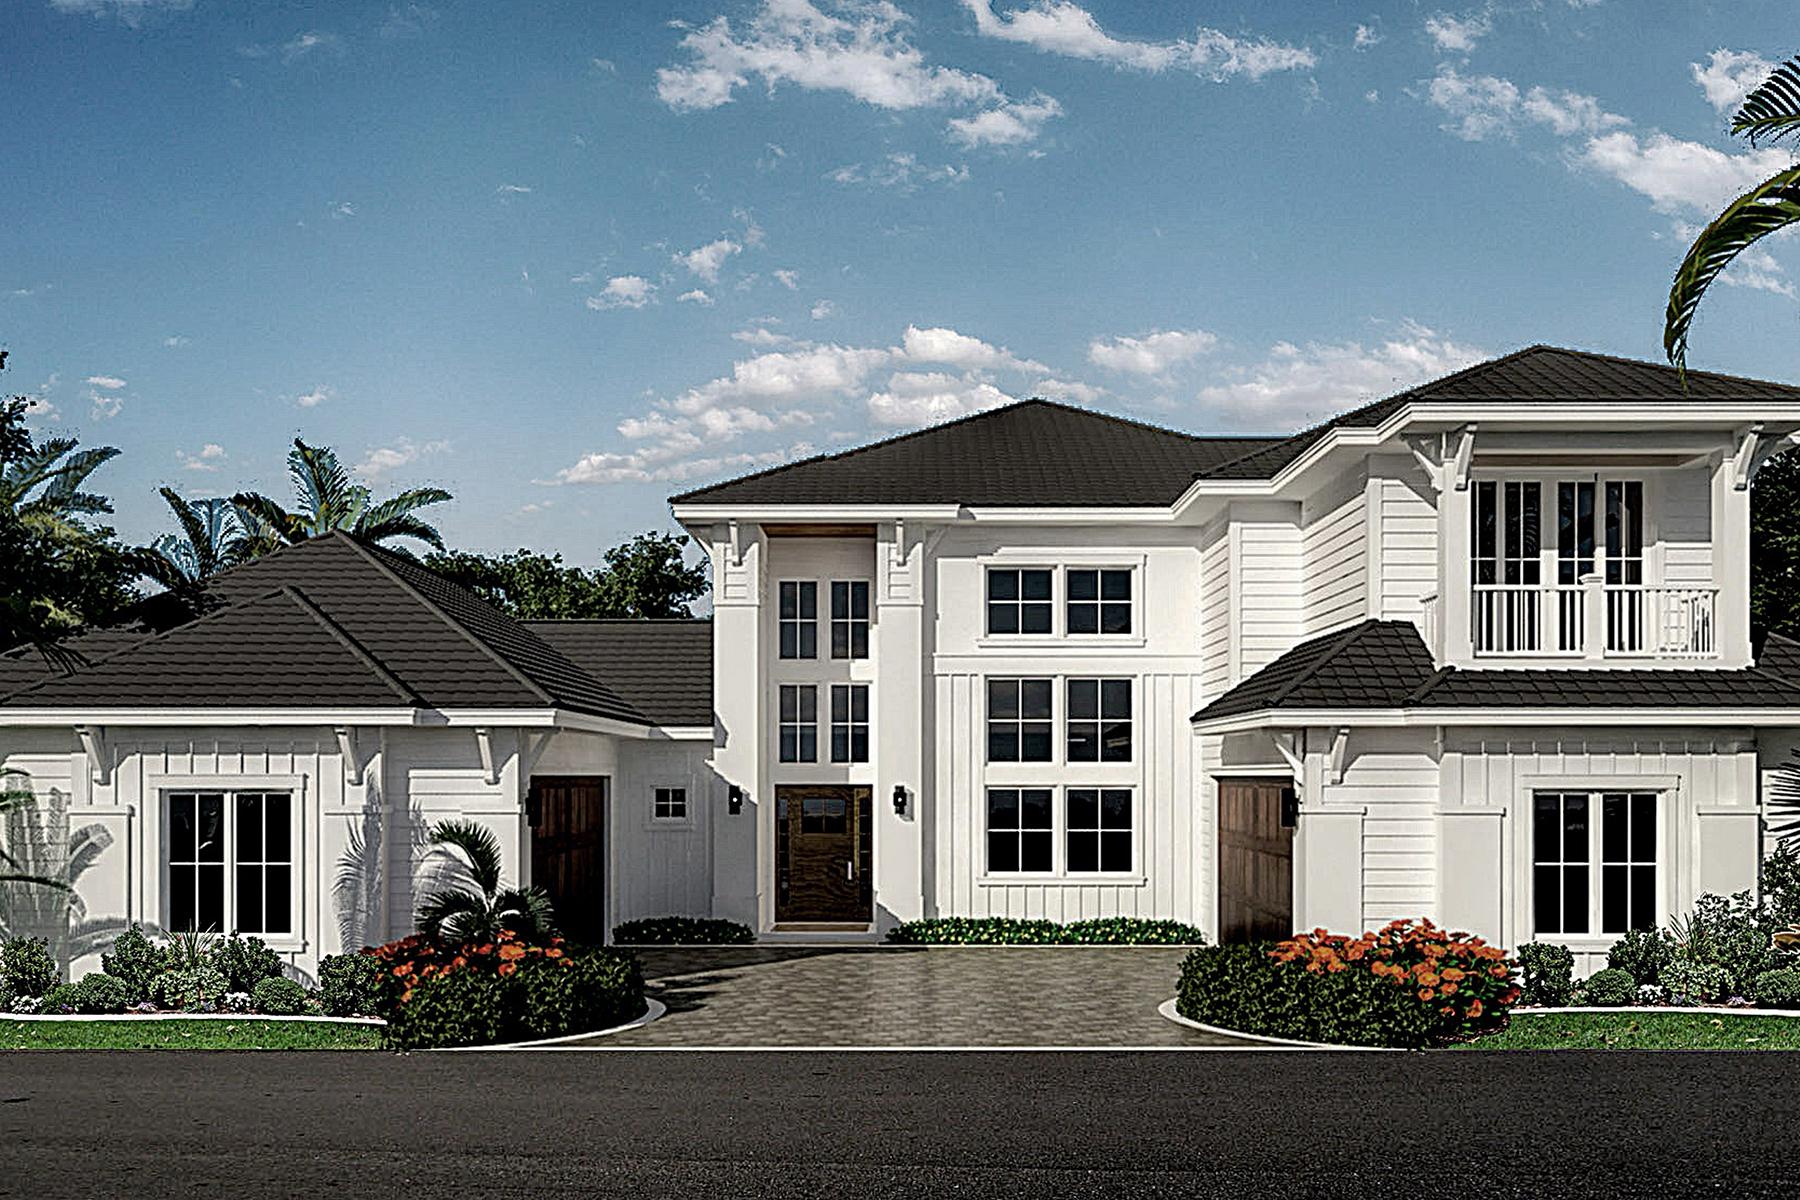 Townhouse for Sale at 9237 Mercato Way , Naples, Fl 34108 9237 Mercato Way Naples, Florida 34108 United States